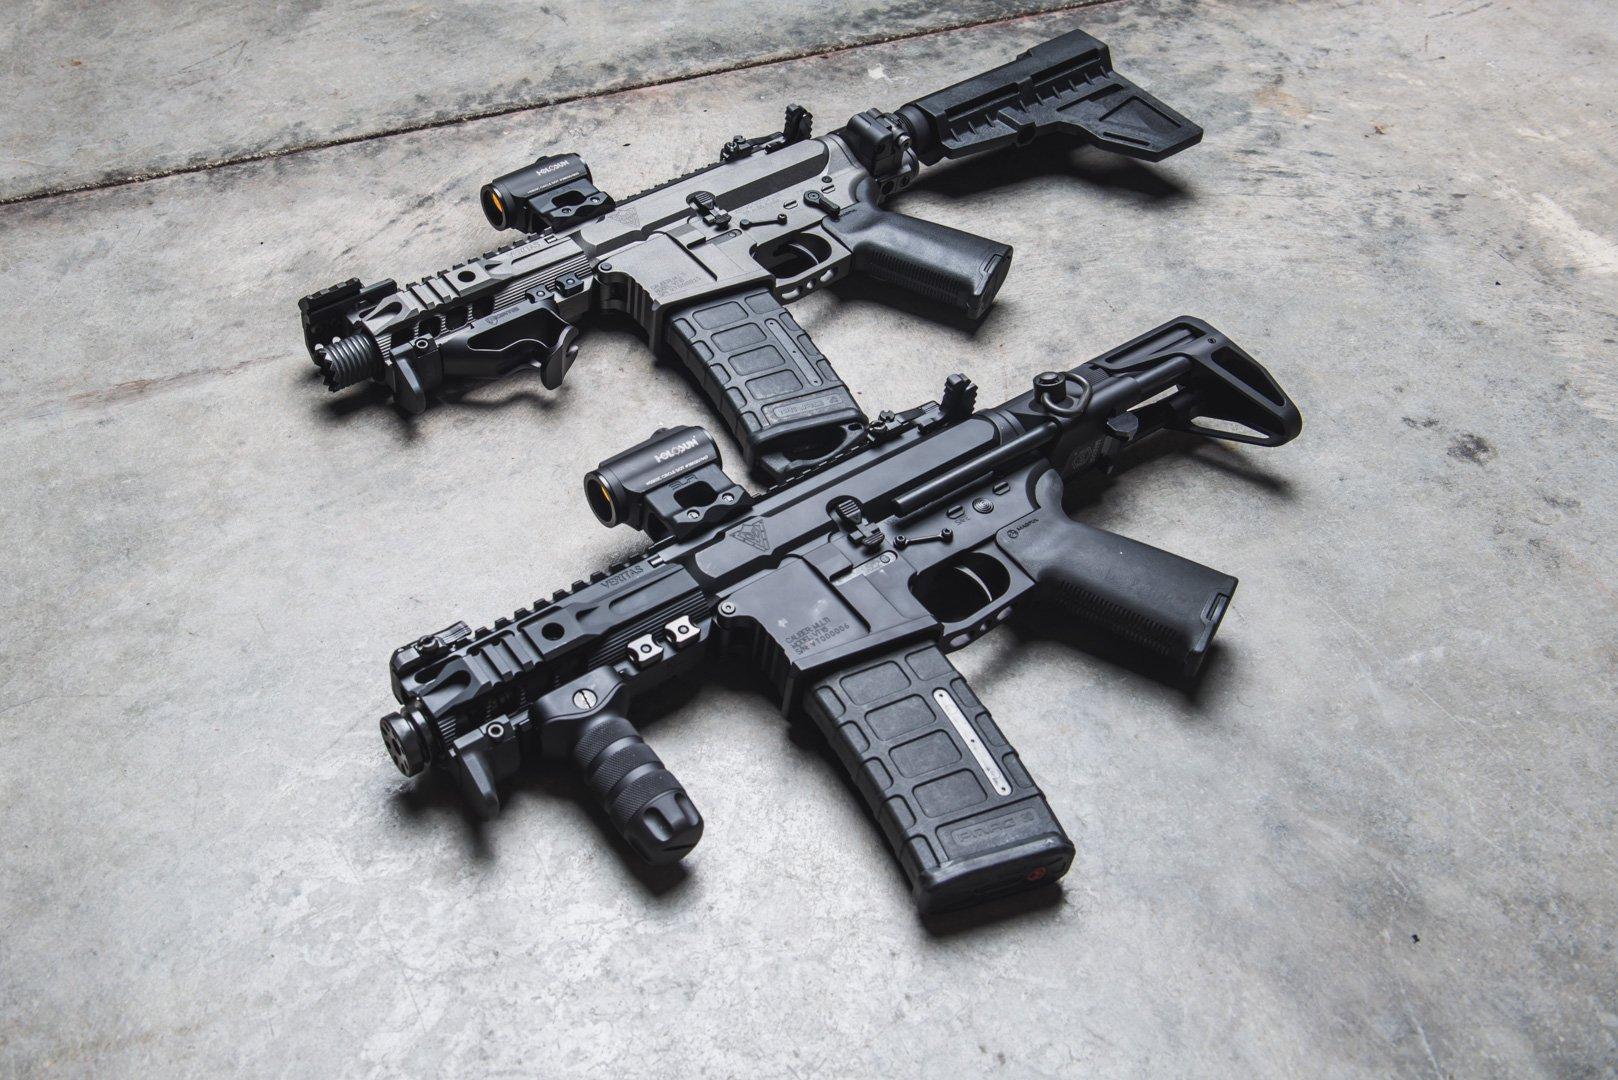 Veritas Tactical